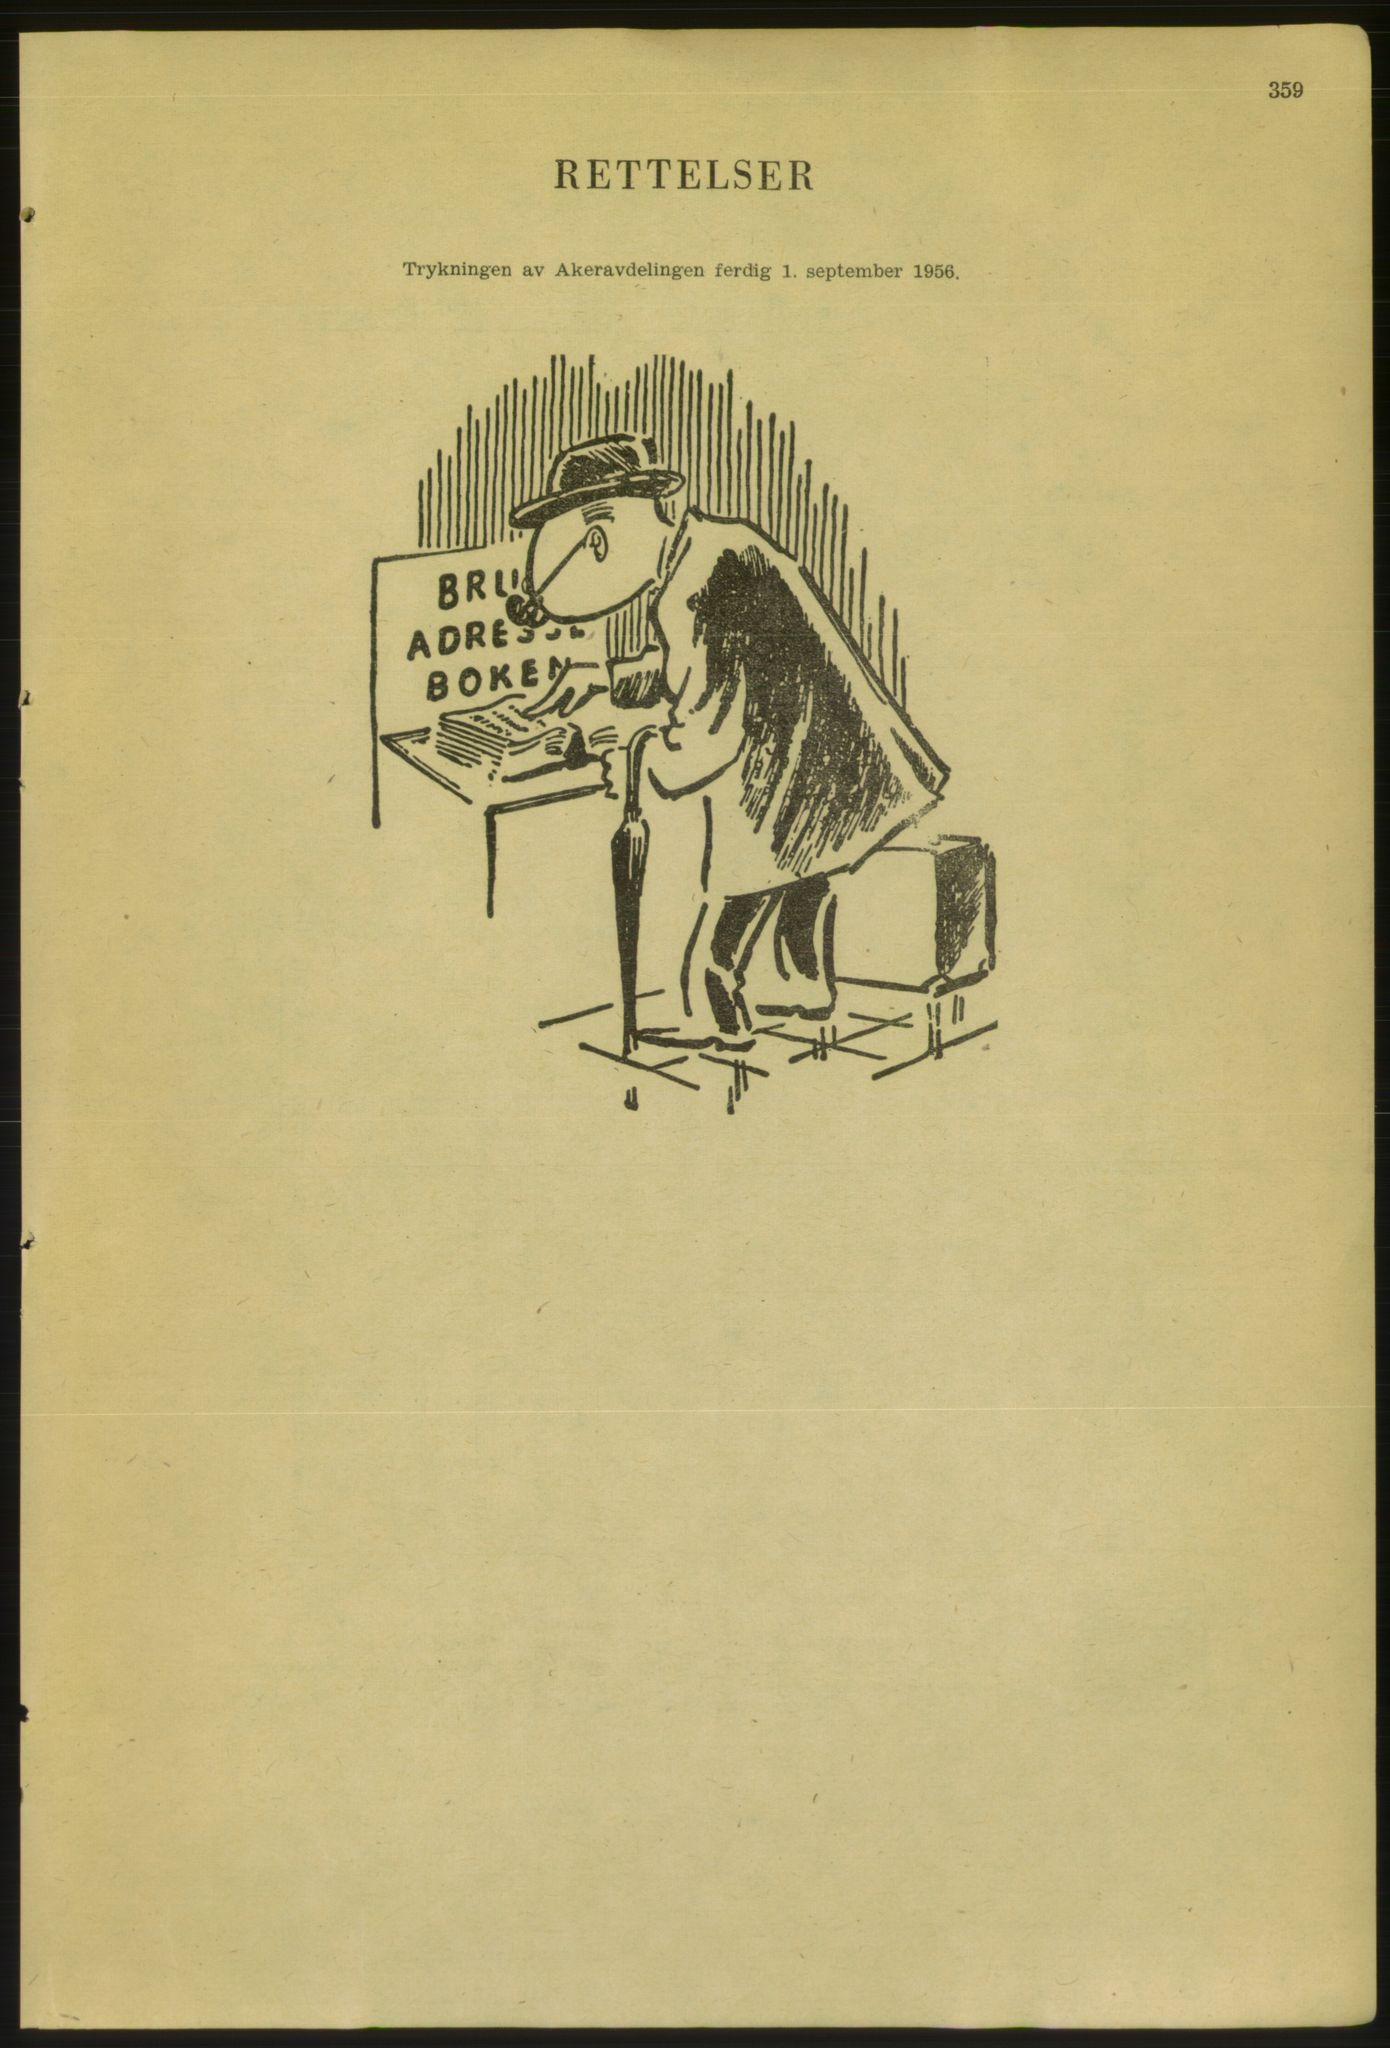 PUBL, Kristiania/Oslo adressebok, 1956-1957, s. 359